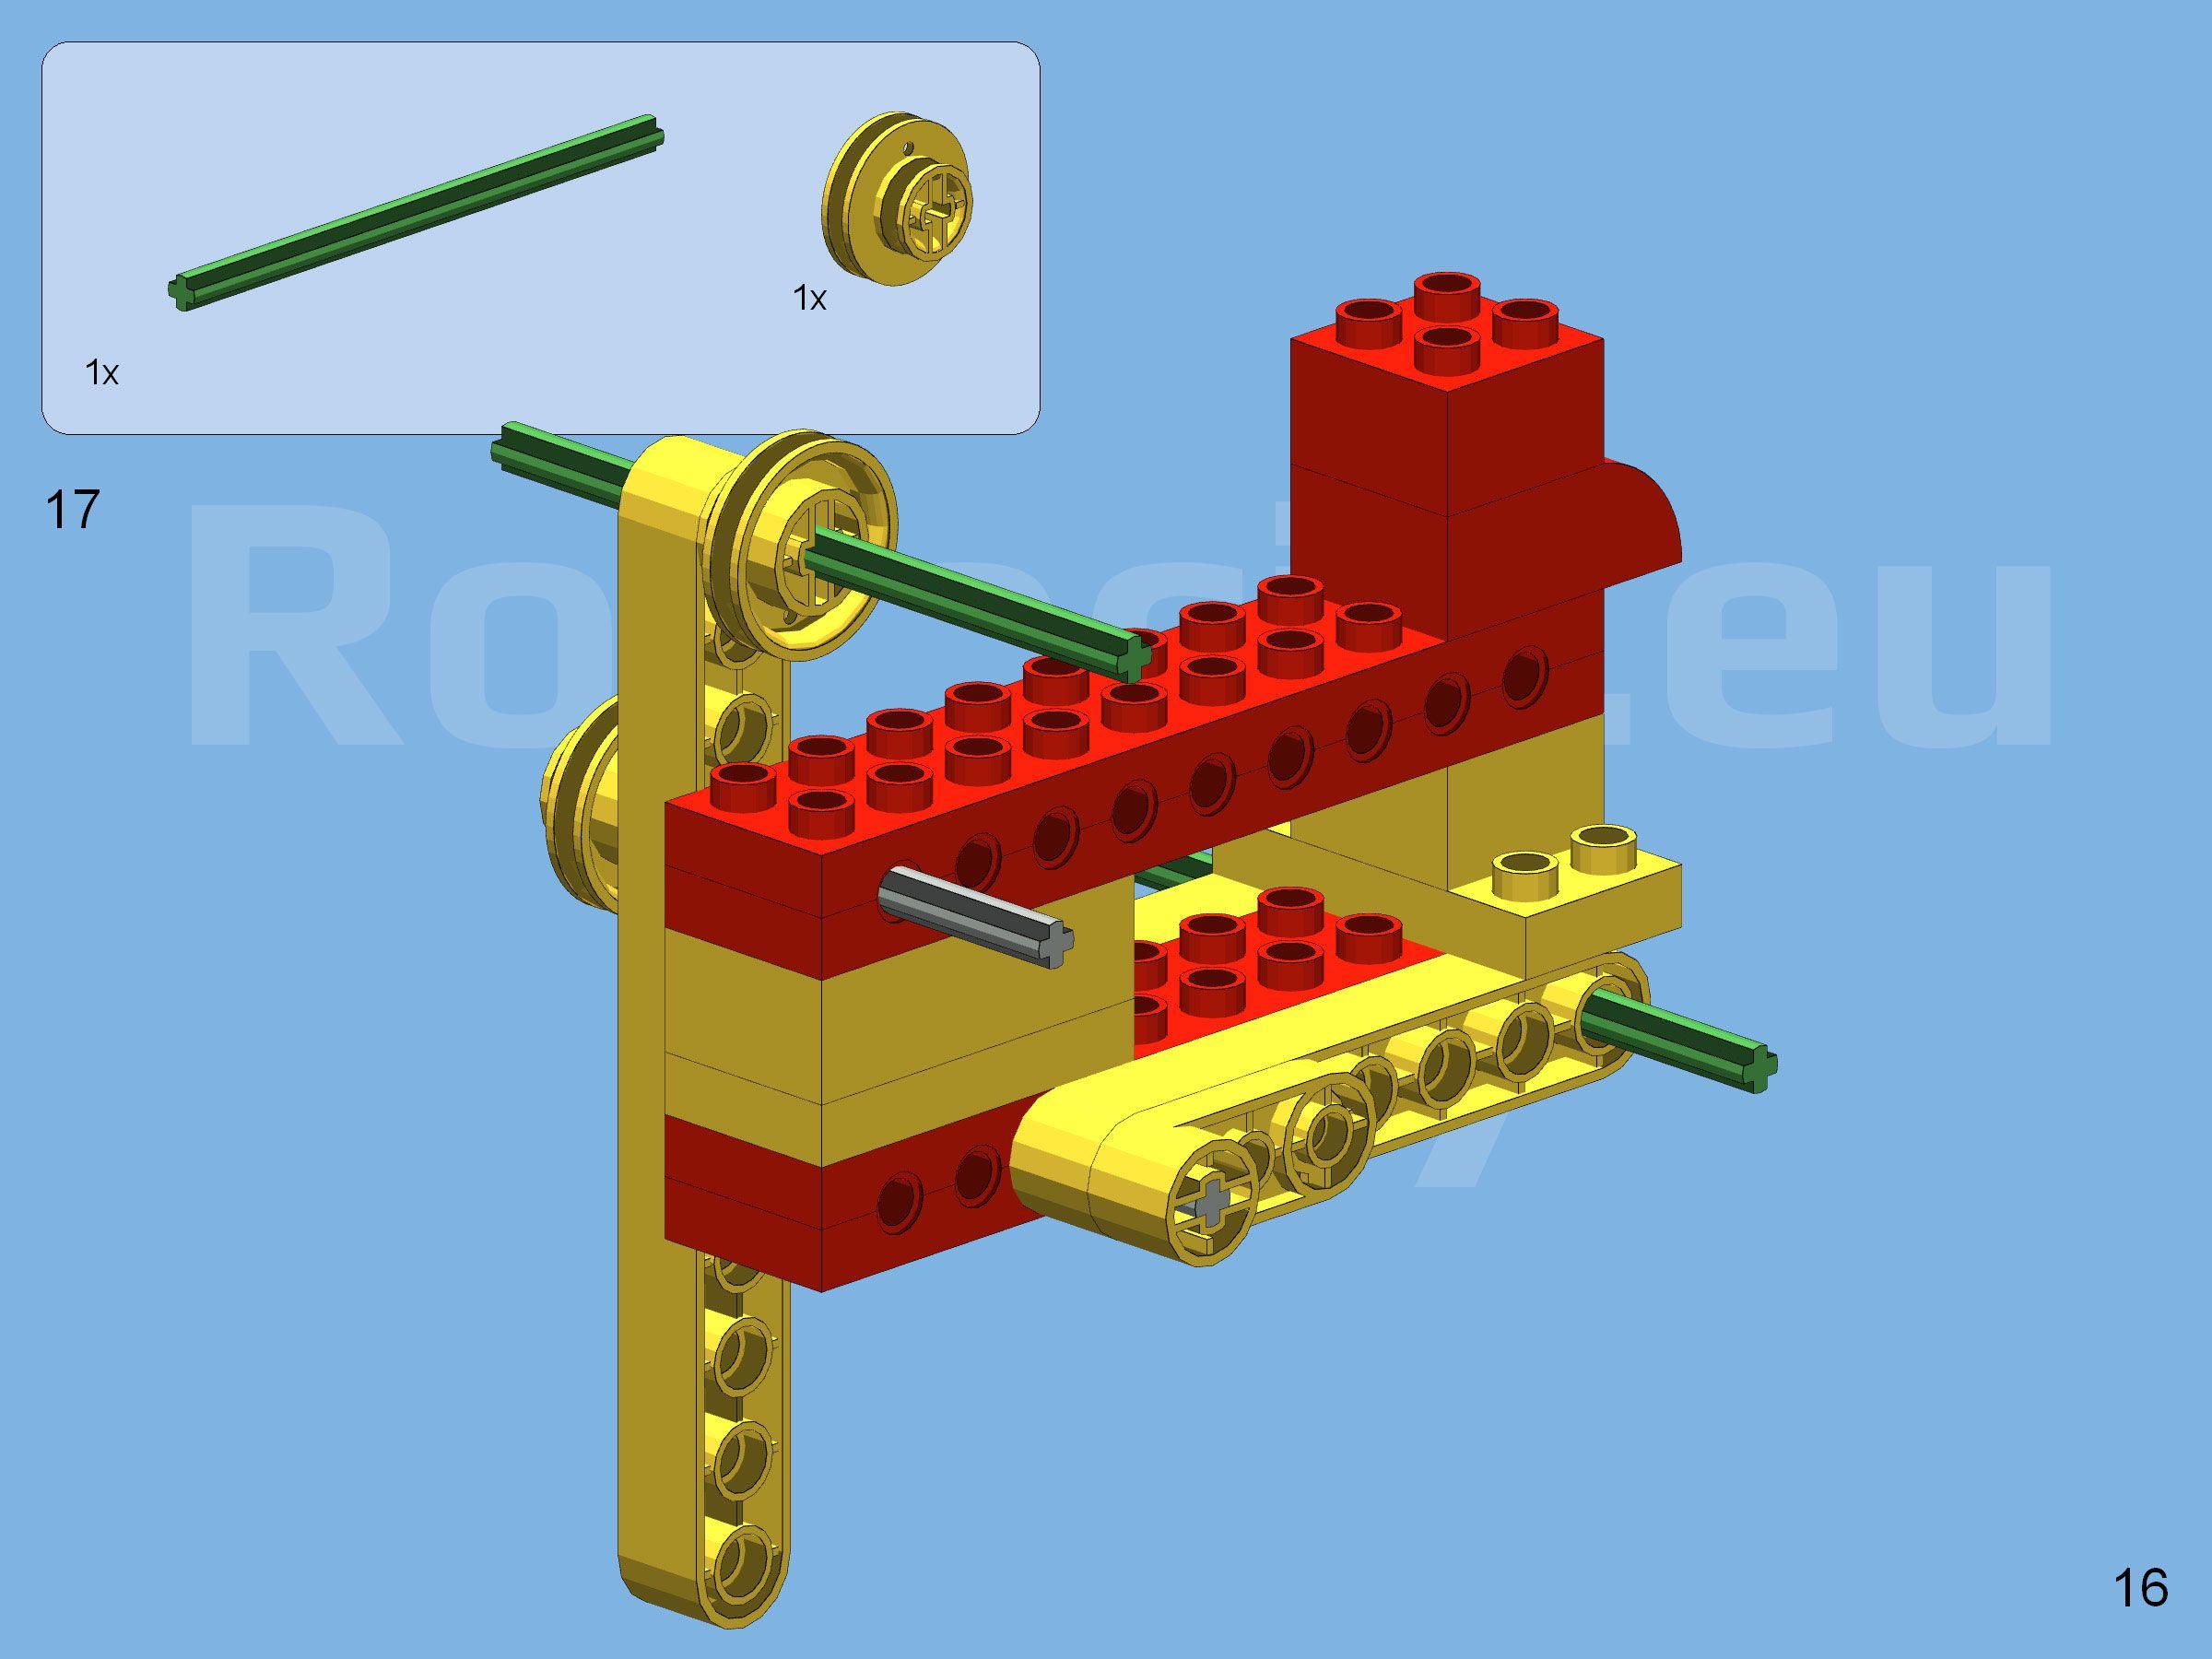 Lego Duplo Early Simple Machines Bike